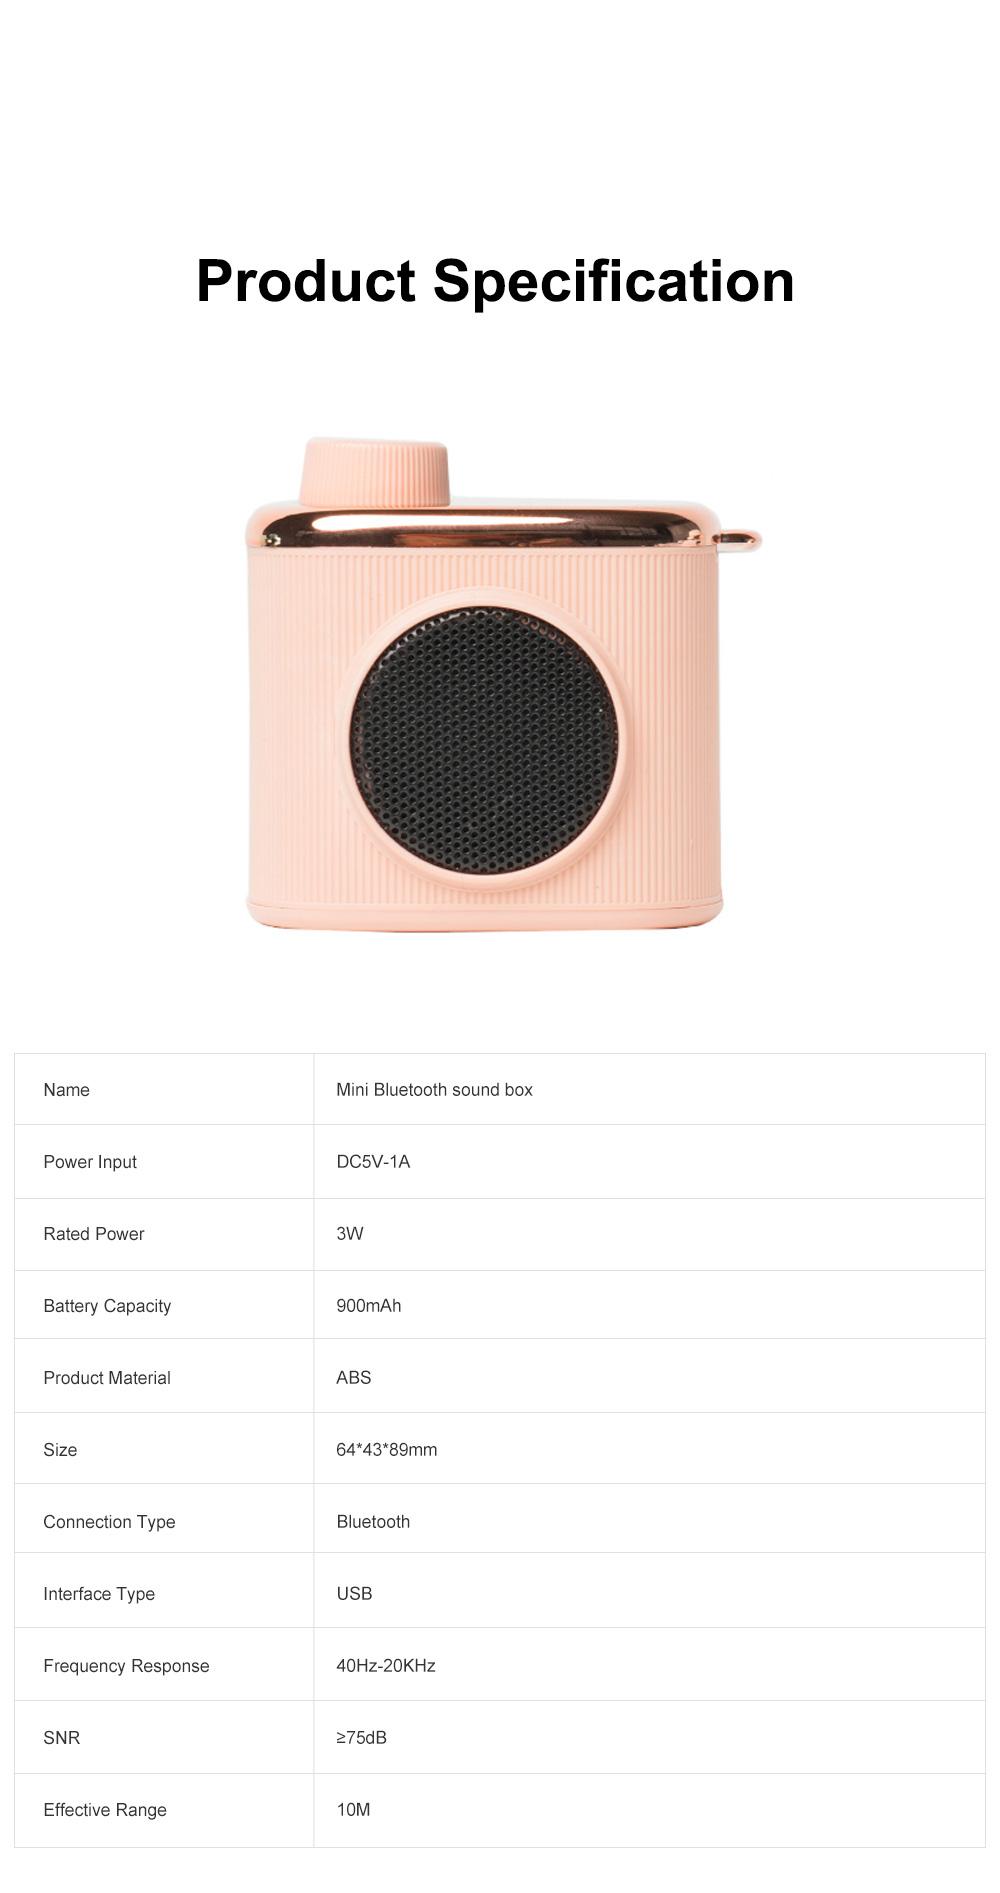 Portable Creative Vintage Camera Model Mini Bluetooth Sound Box Easy Operation USB Memory Loudspeaker Box 7